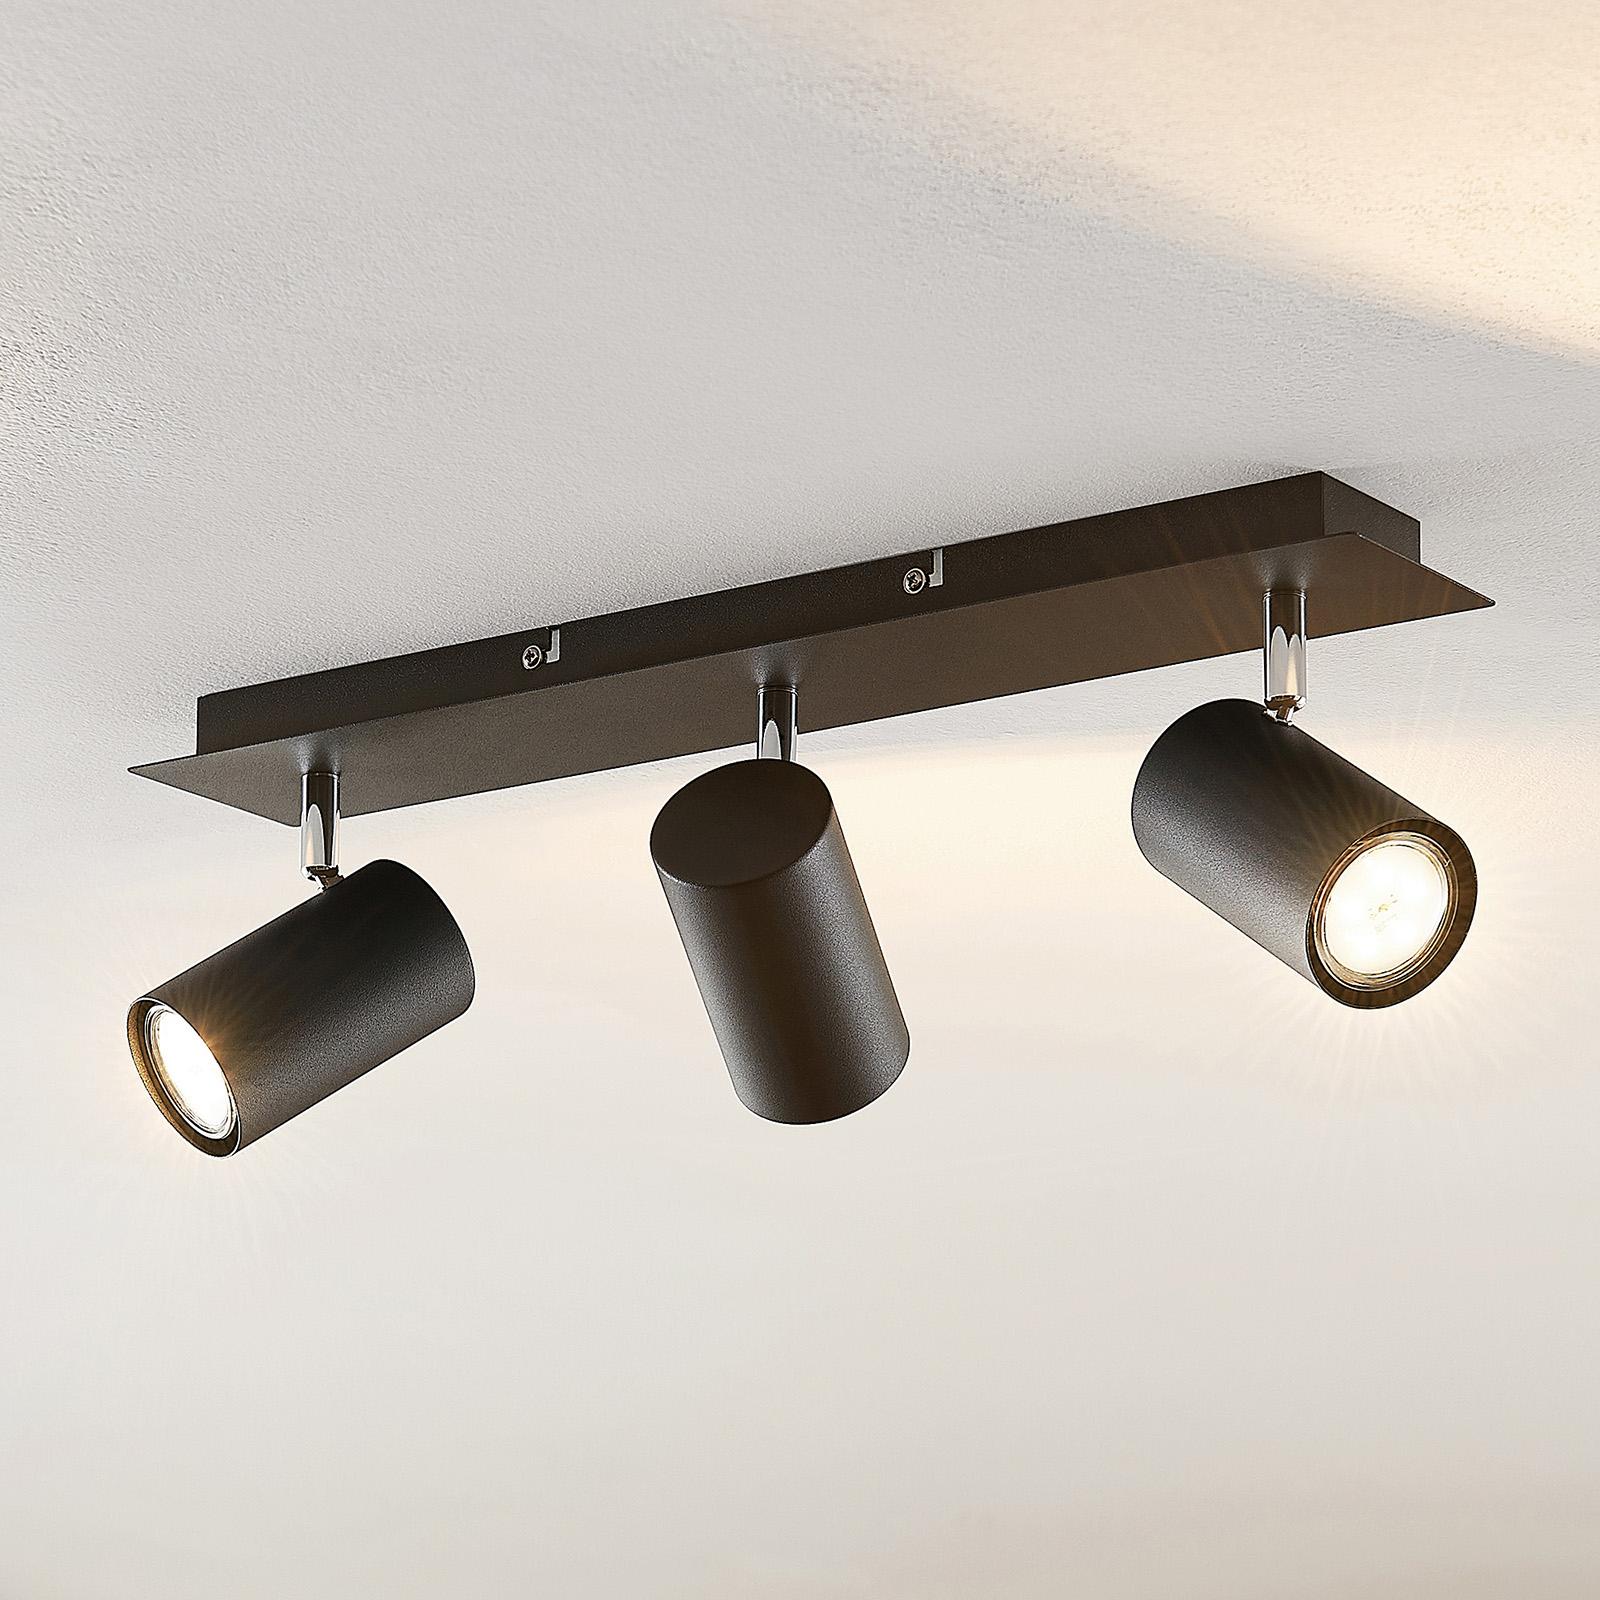 Lindby Joffrey ceiling spotlight, 3-bulb, black_9624829_1